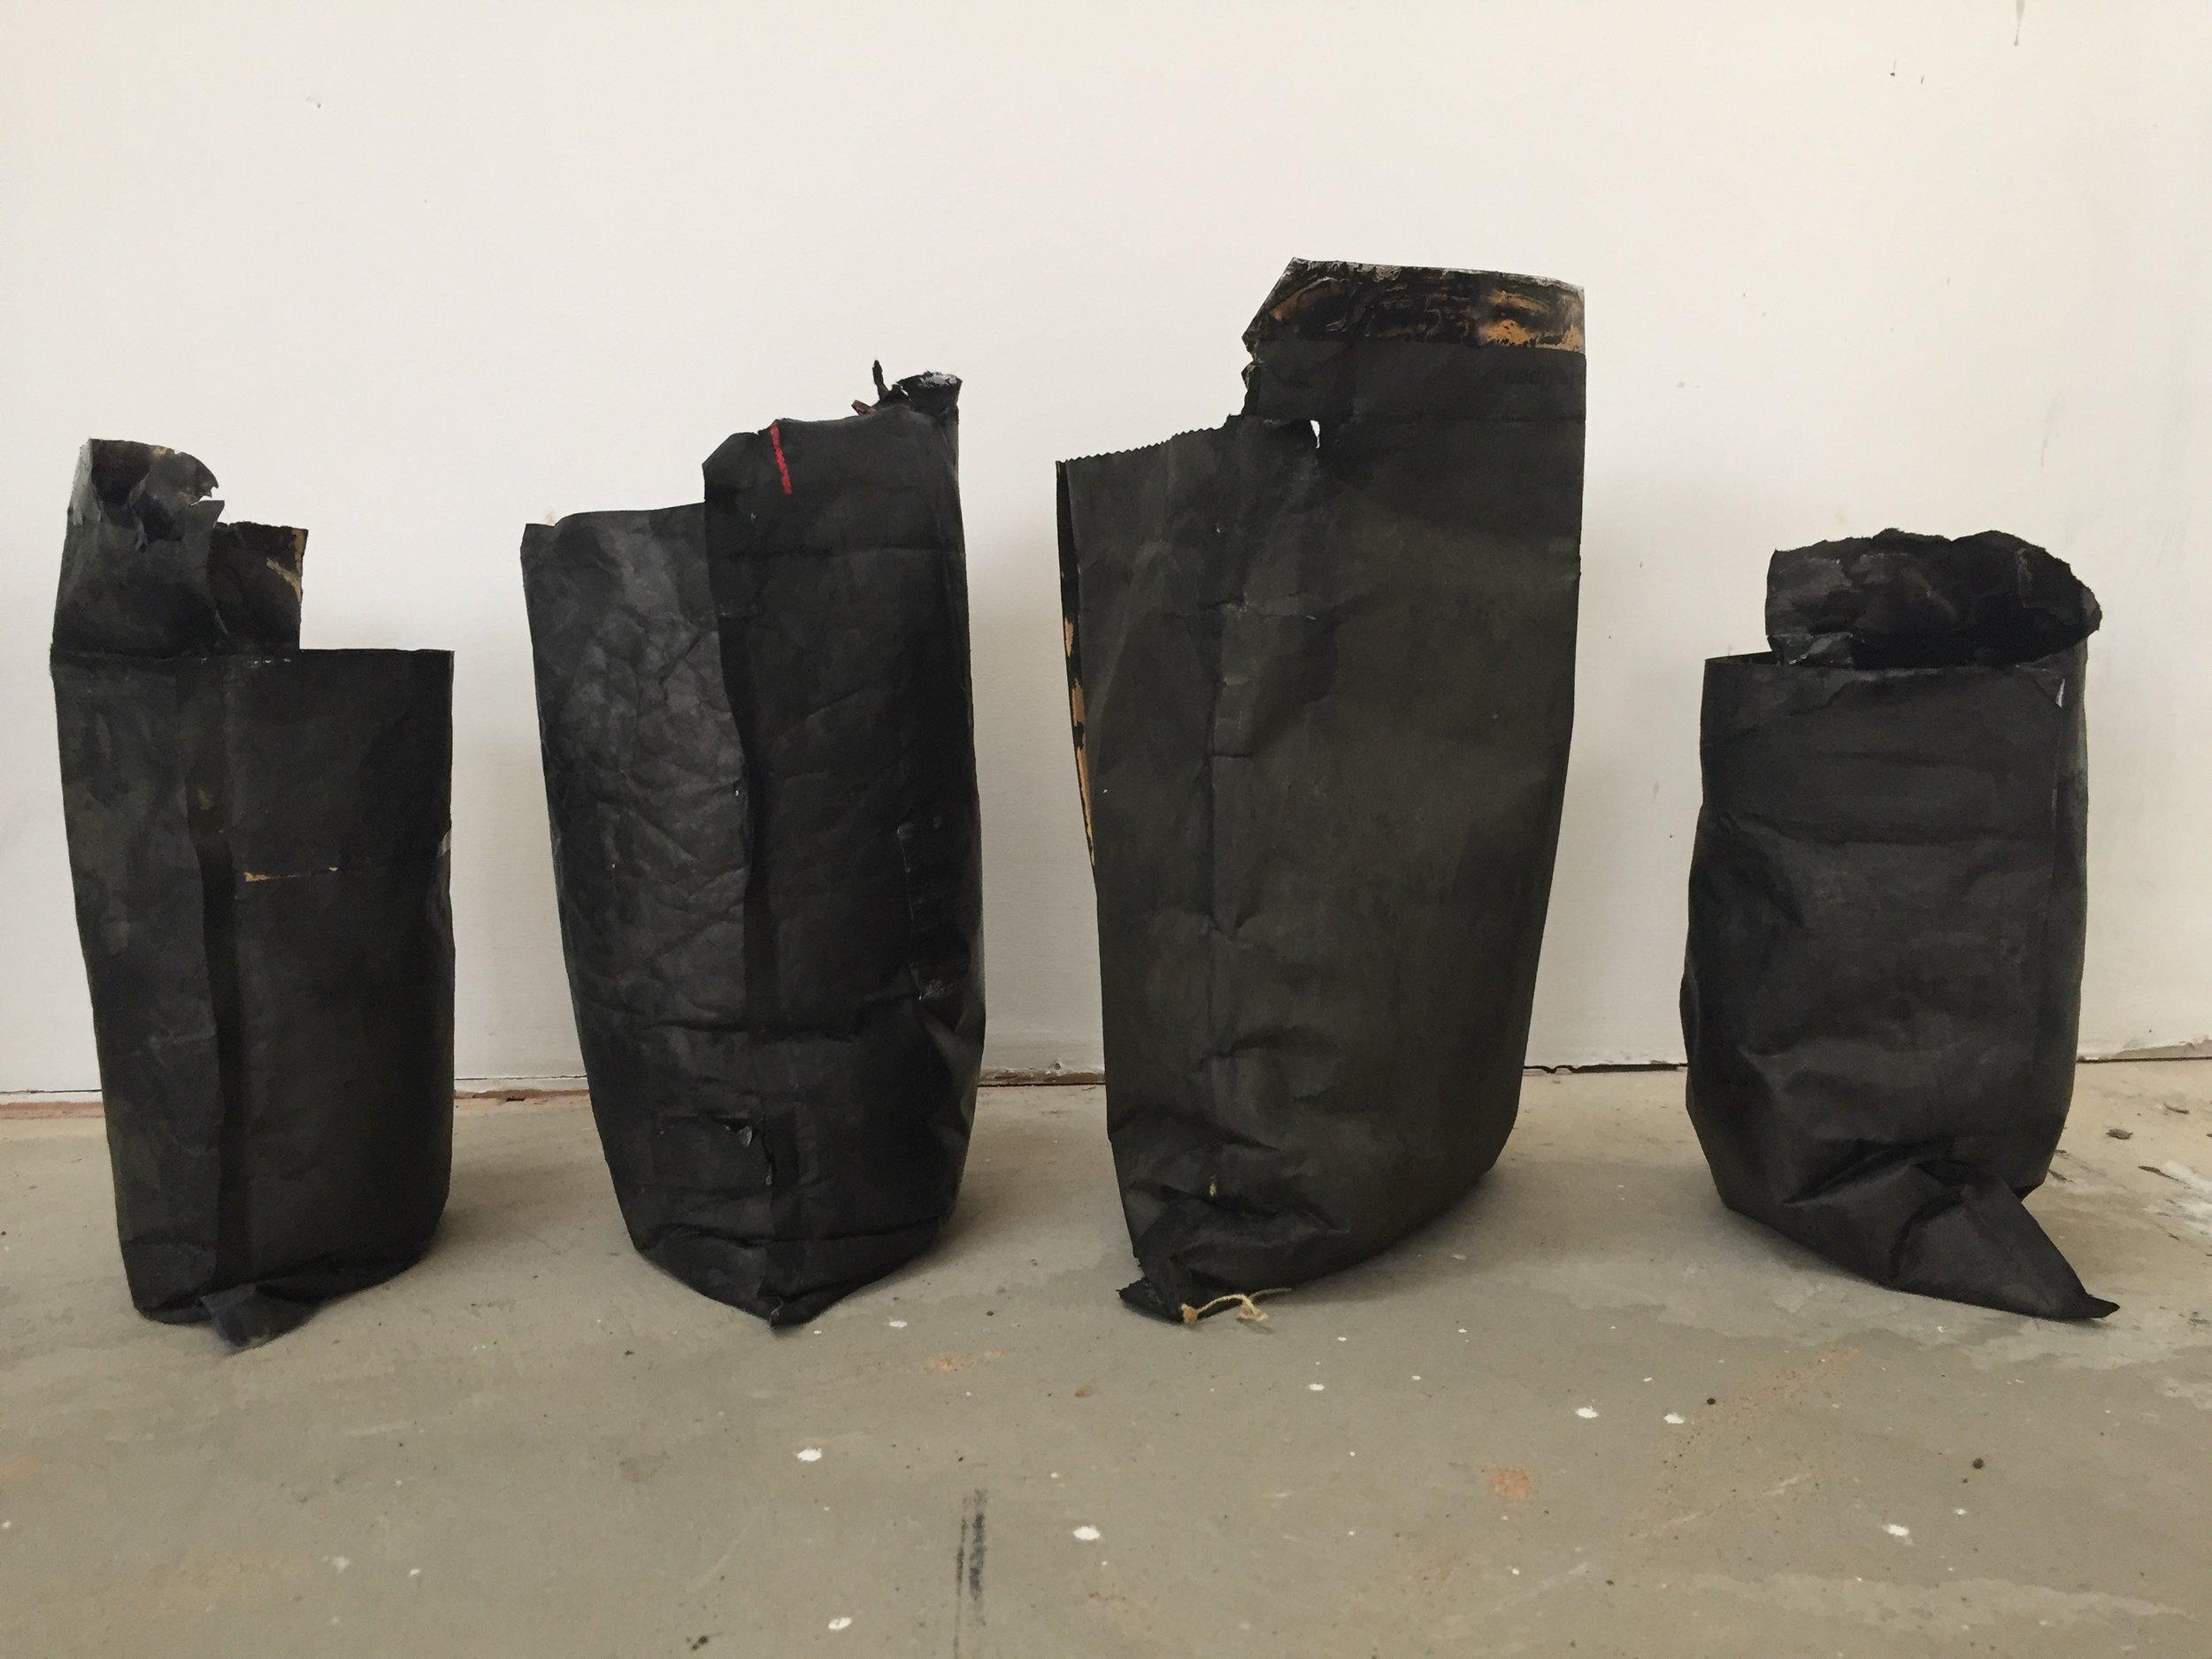 Alice Sheppard Fidler Bags 2.JPG